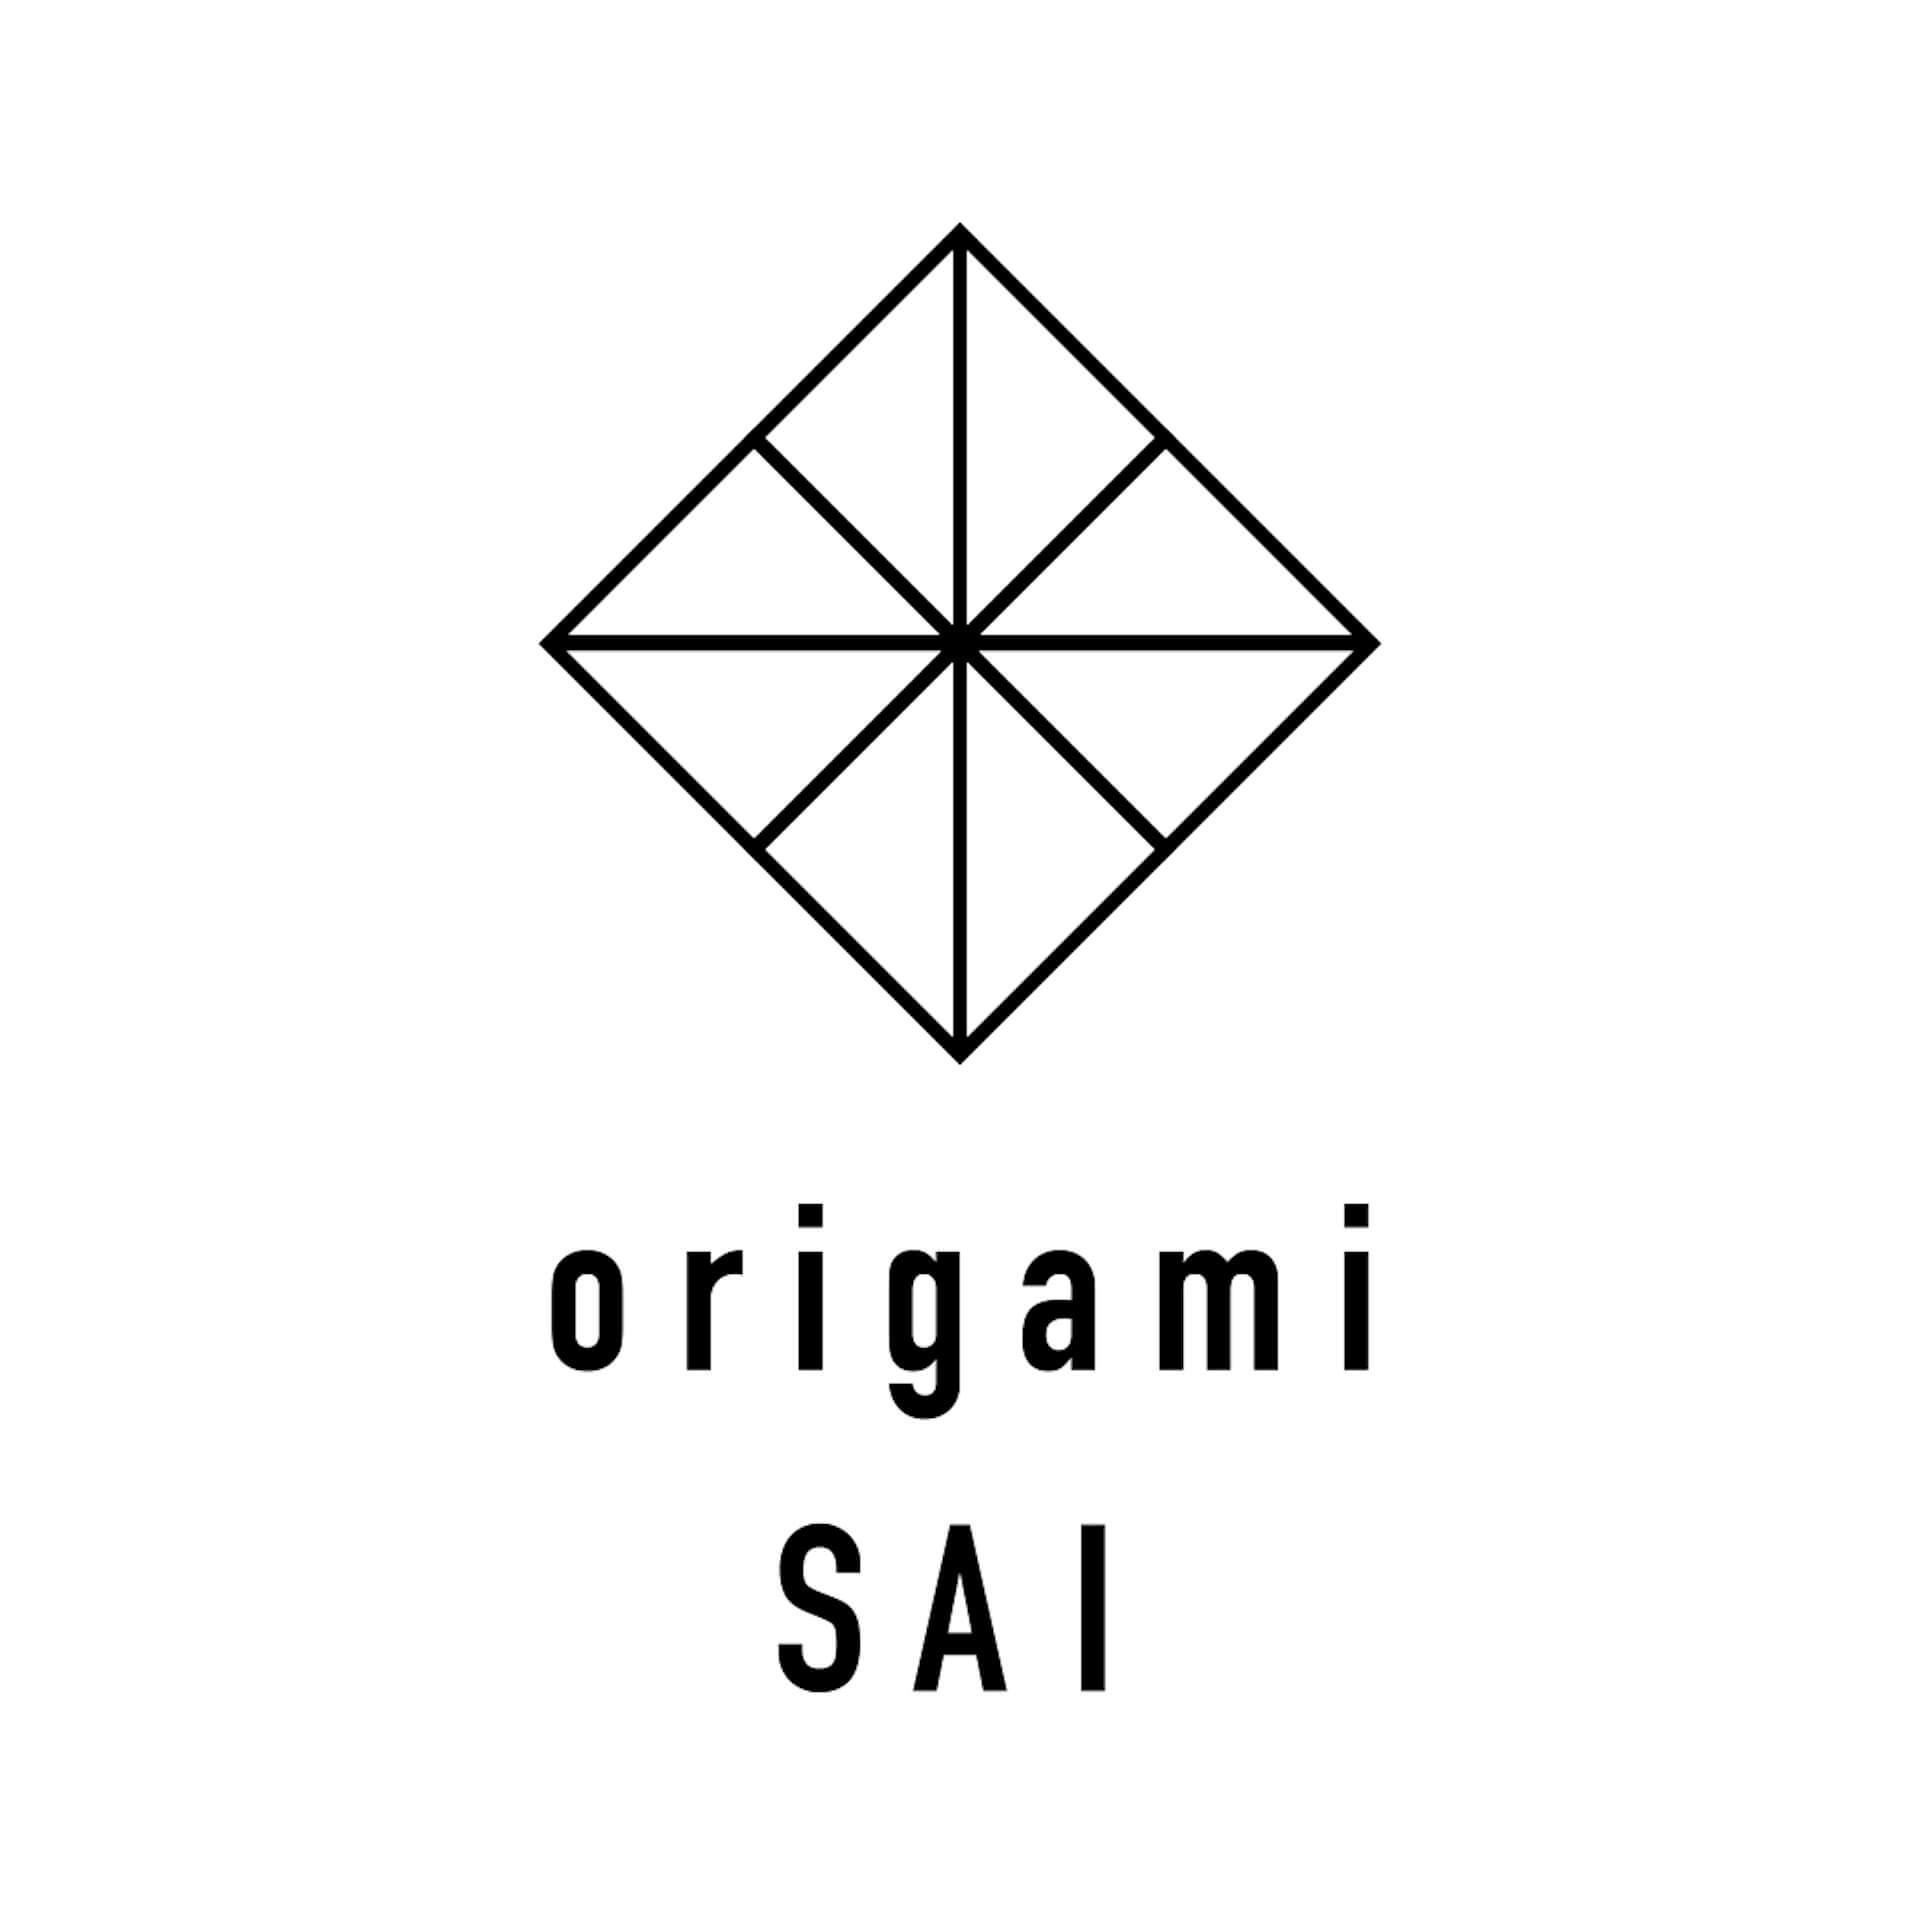 Kan Sano、mabanua、Michael Kanekoらのライブ映像が見られる!<origami SAI 2019>のイベント映像がYouTubeでプレミア公開 music200129_origamisai_main